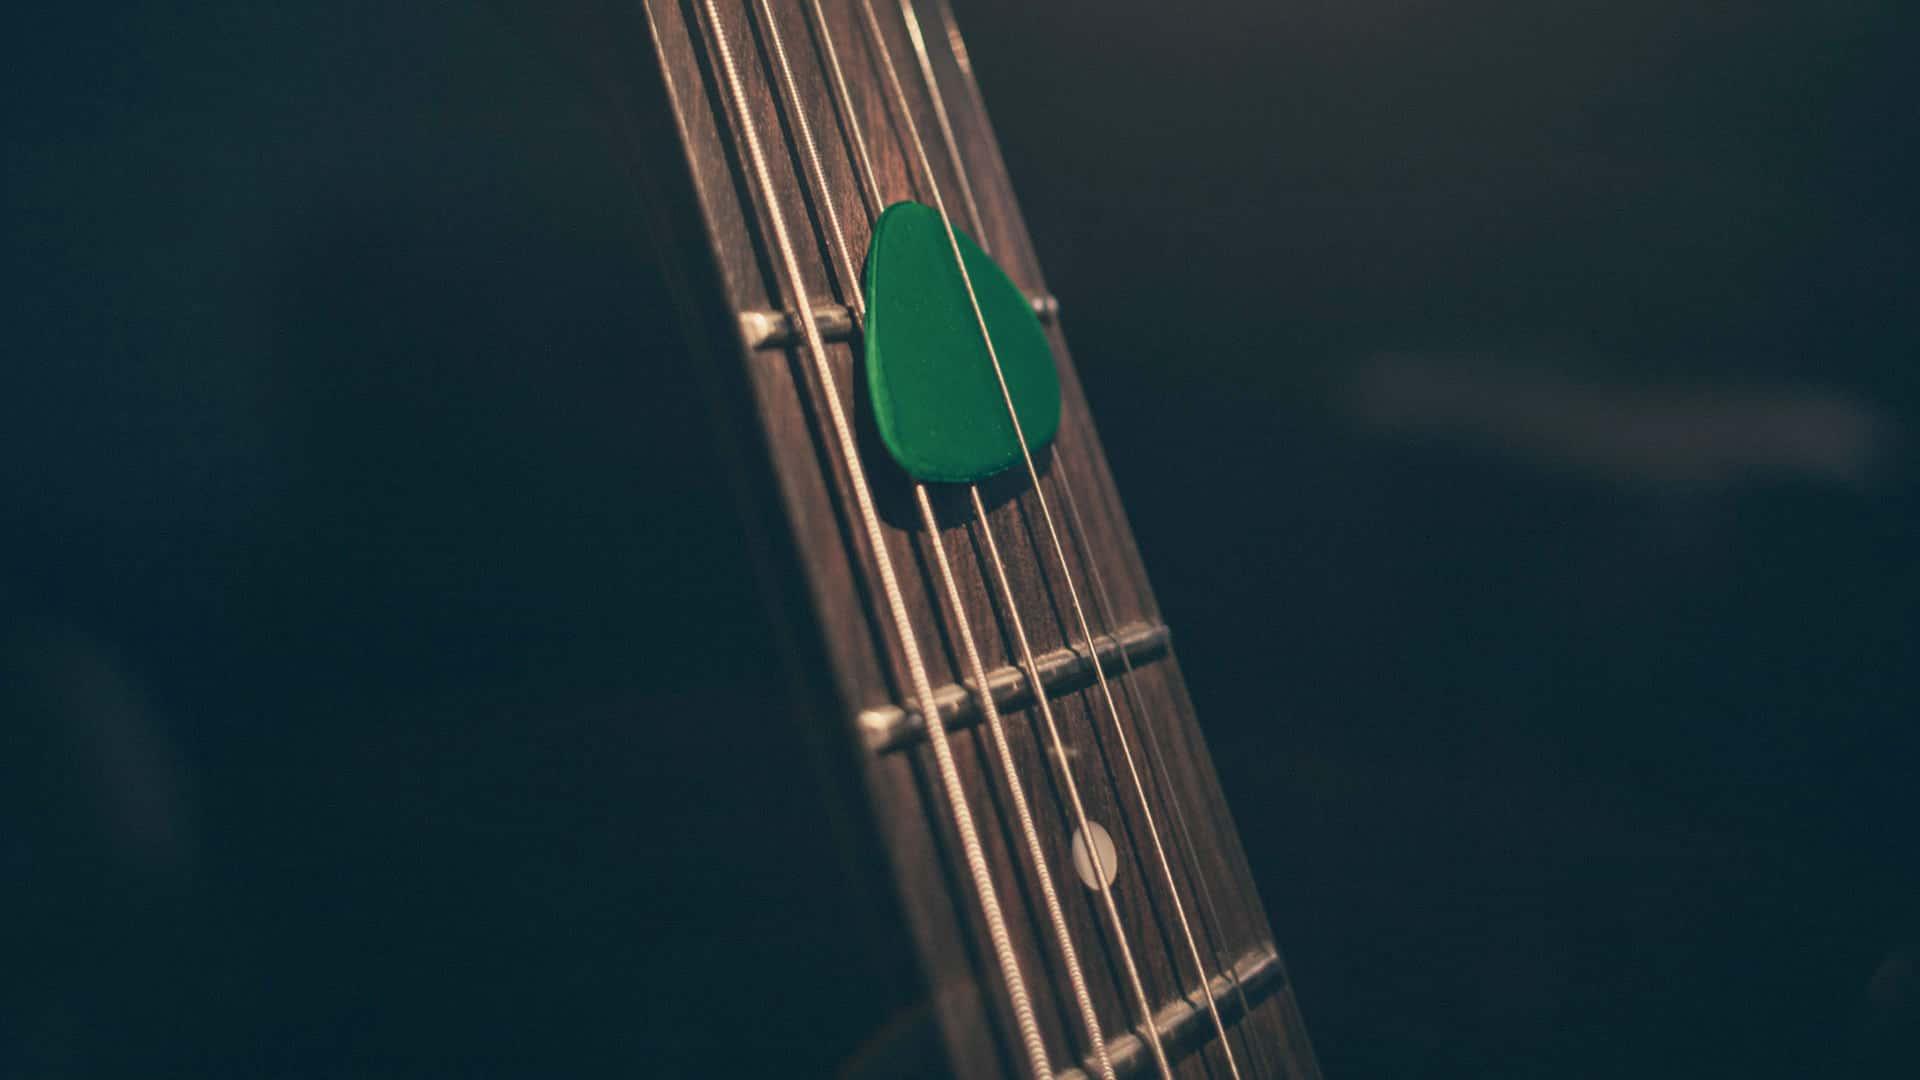 Médiator vert sur manche de guitare